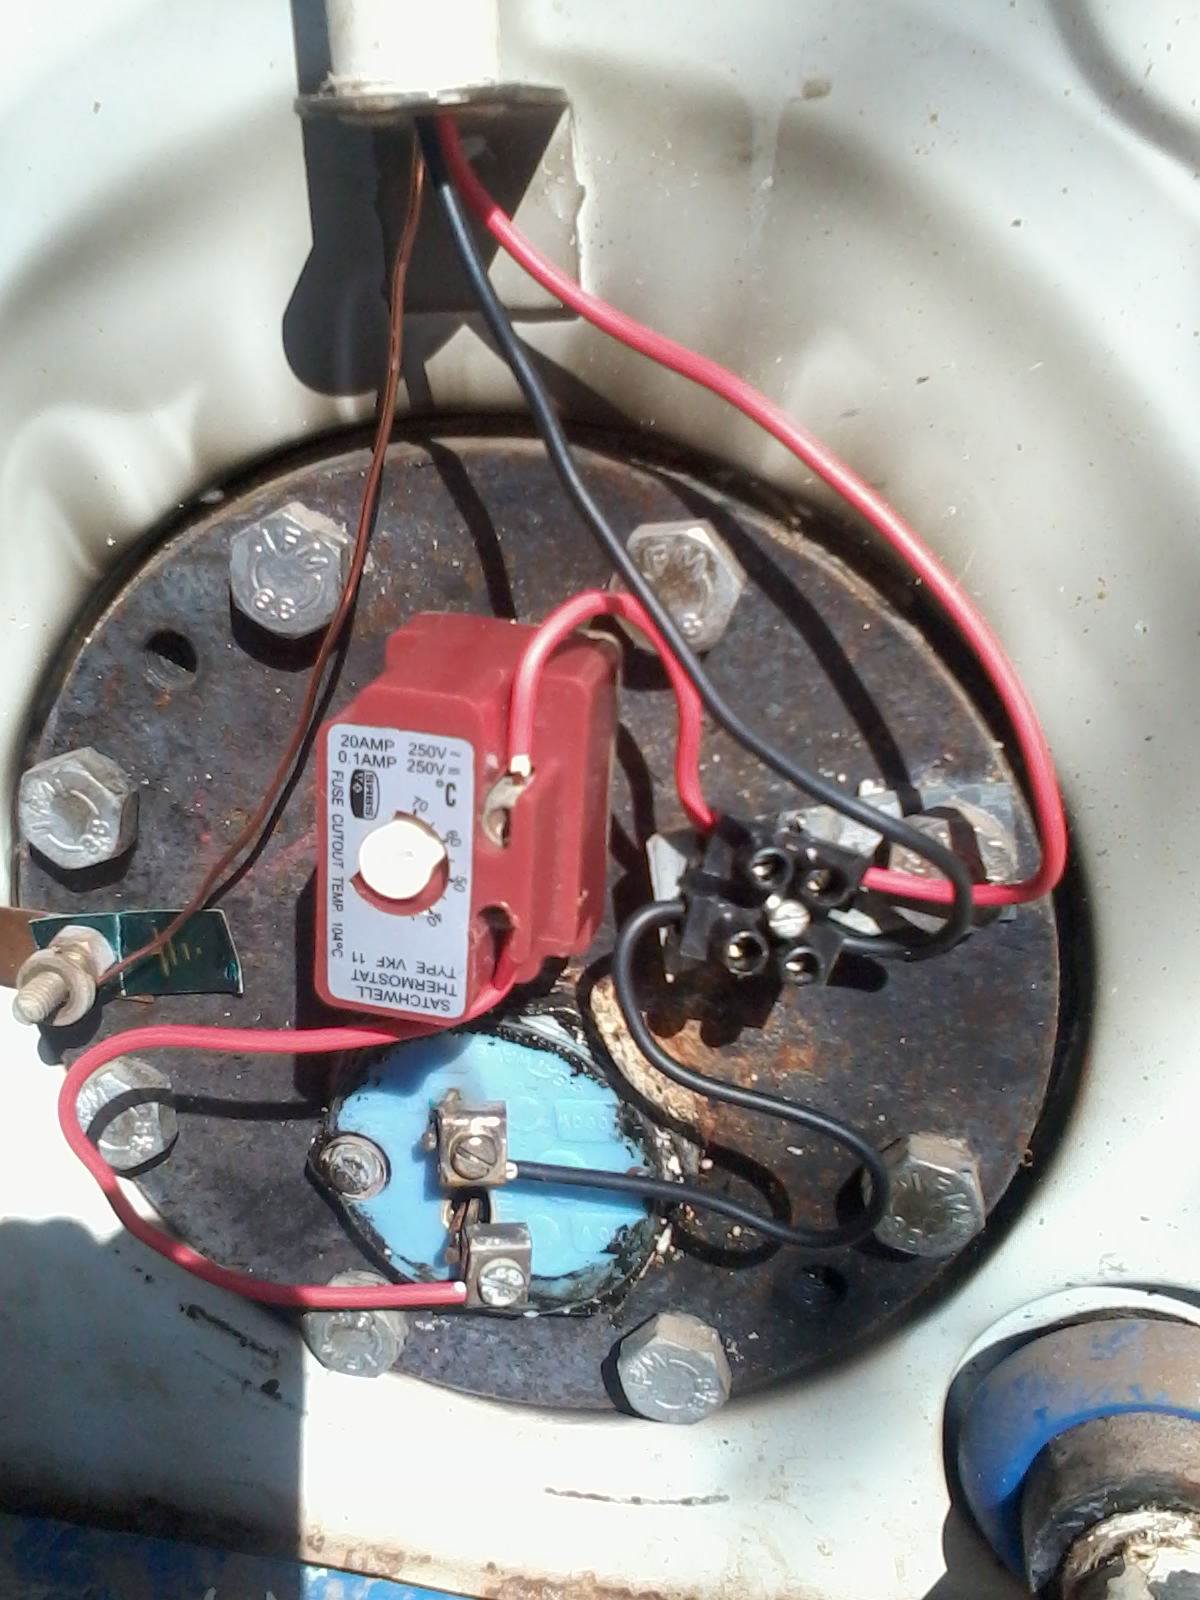 Geyser Thermostat Wiring Diagram Blank Cell Worksheet Plumber Pretoria North Plumbing